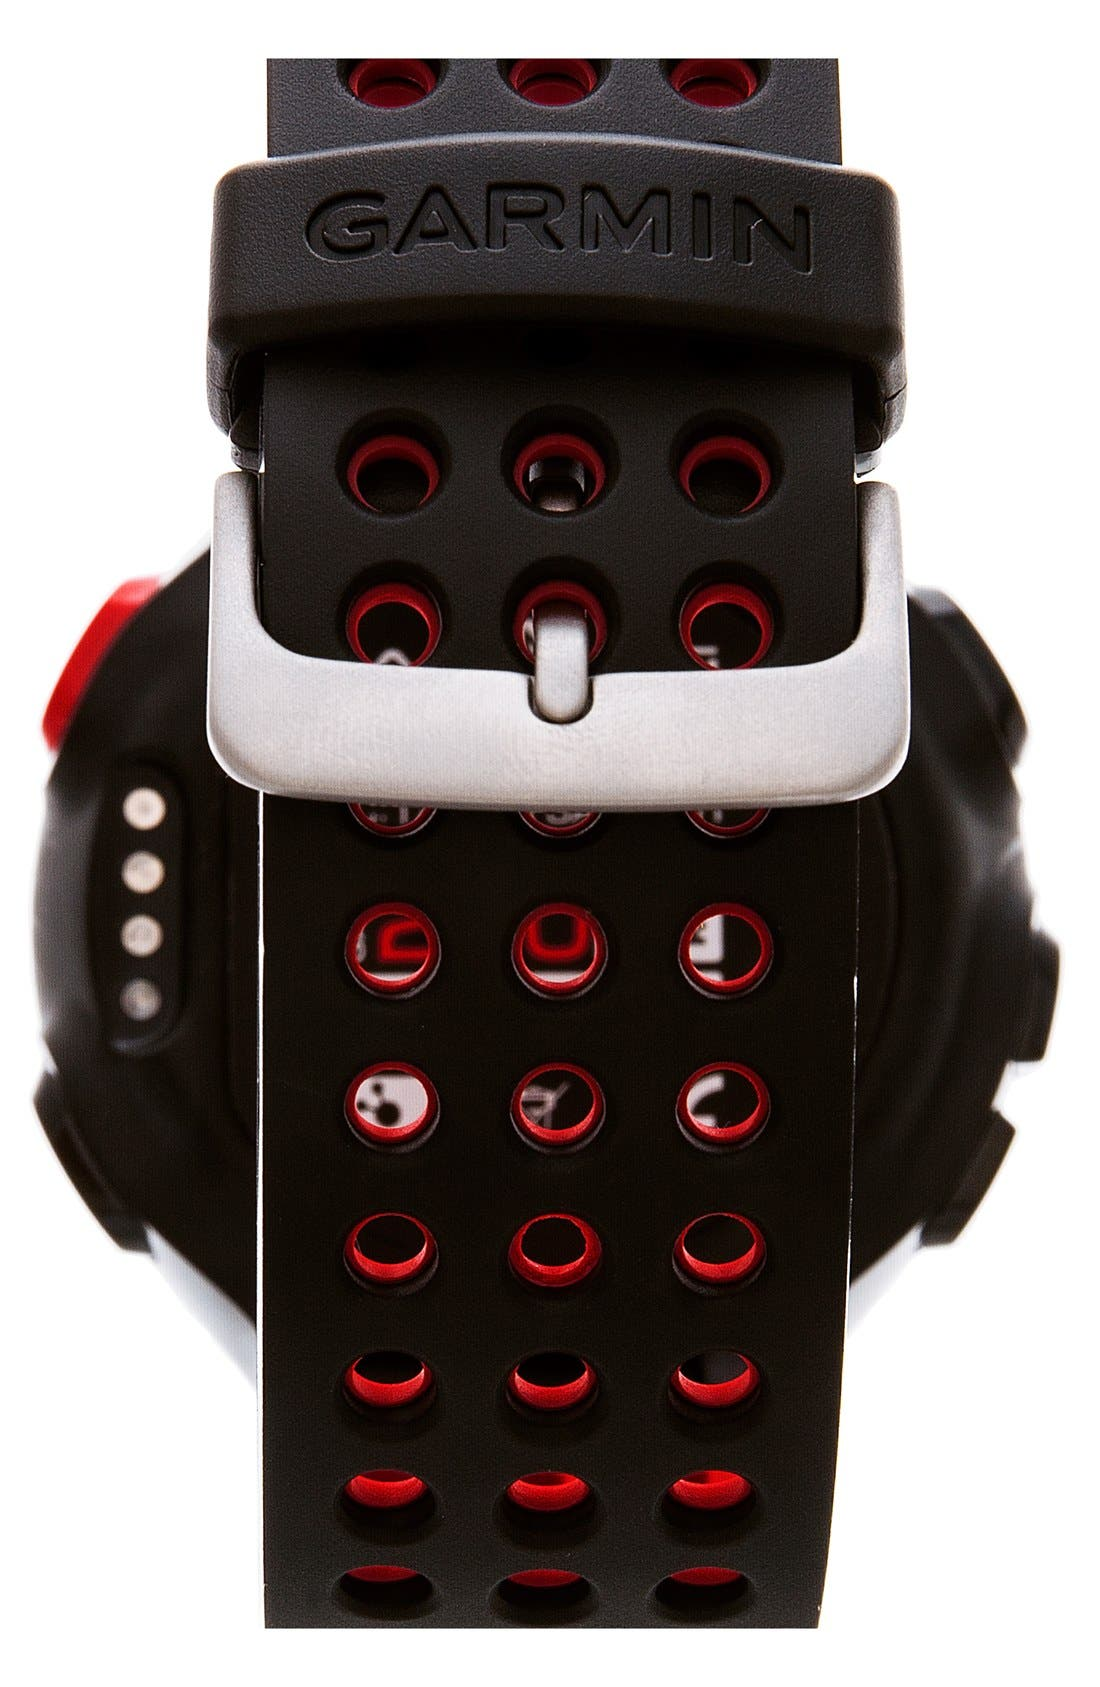 GARMIN,                             'Forerunner 220' Fitness Watch, 45mm,                             Alternate thumbnail 2, color,                             001